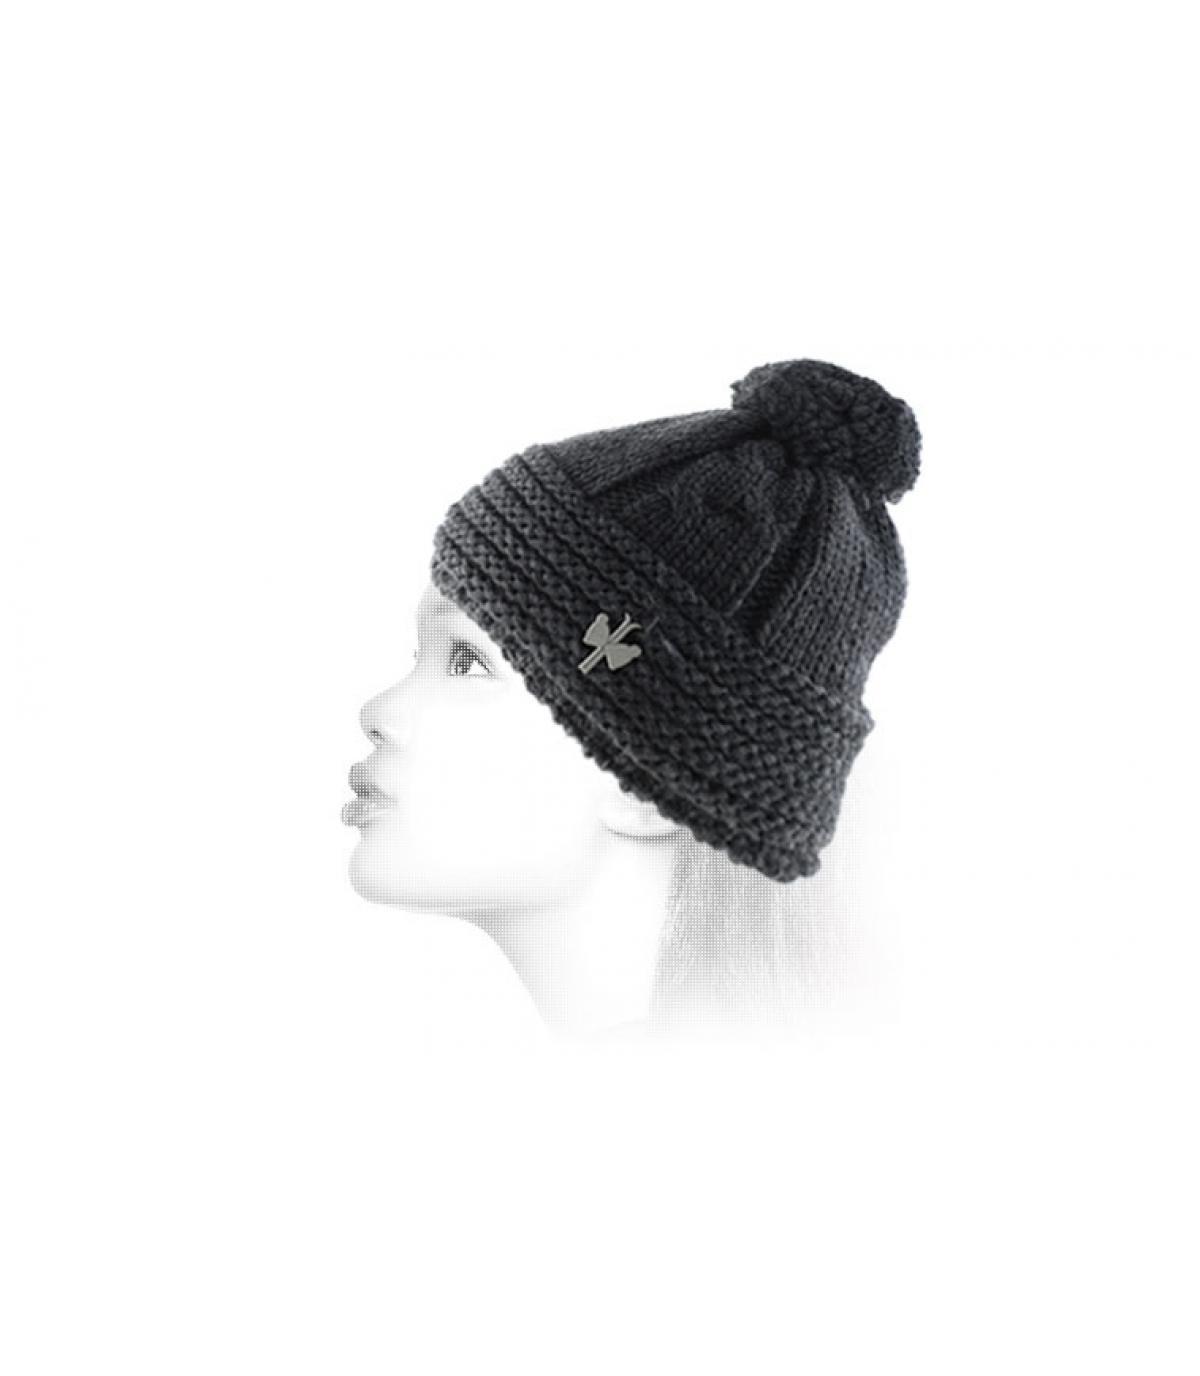 Bommelmütze Damen schwarz Mütze